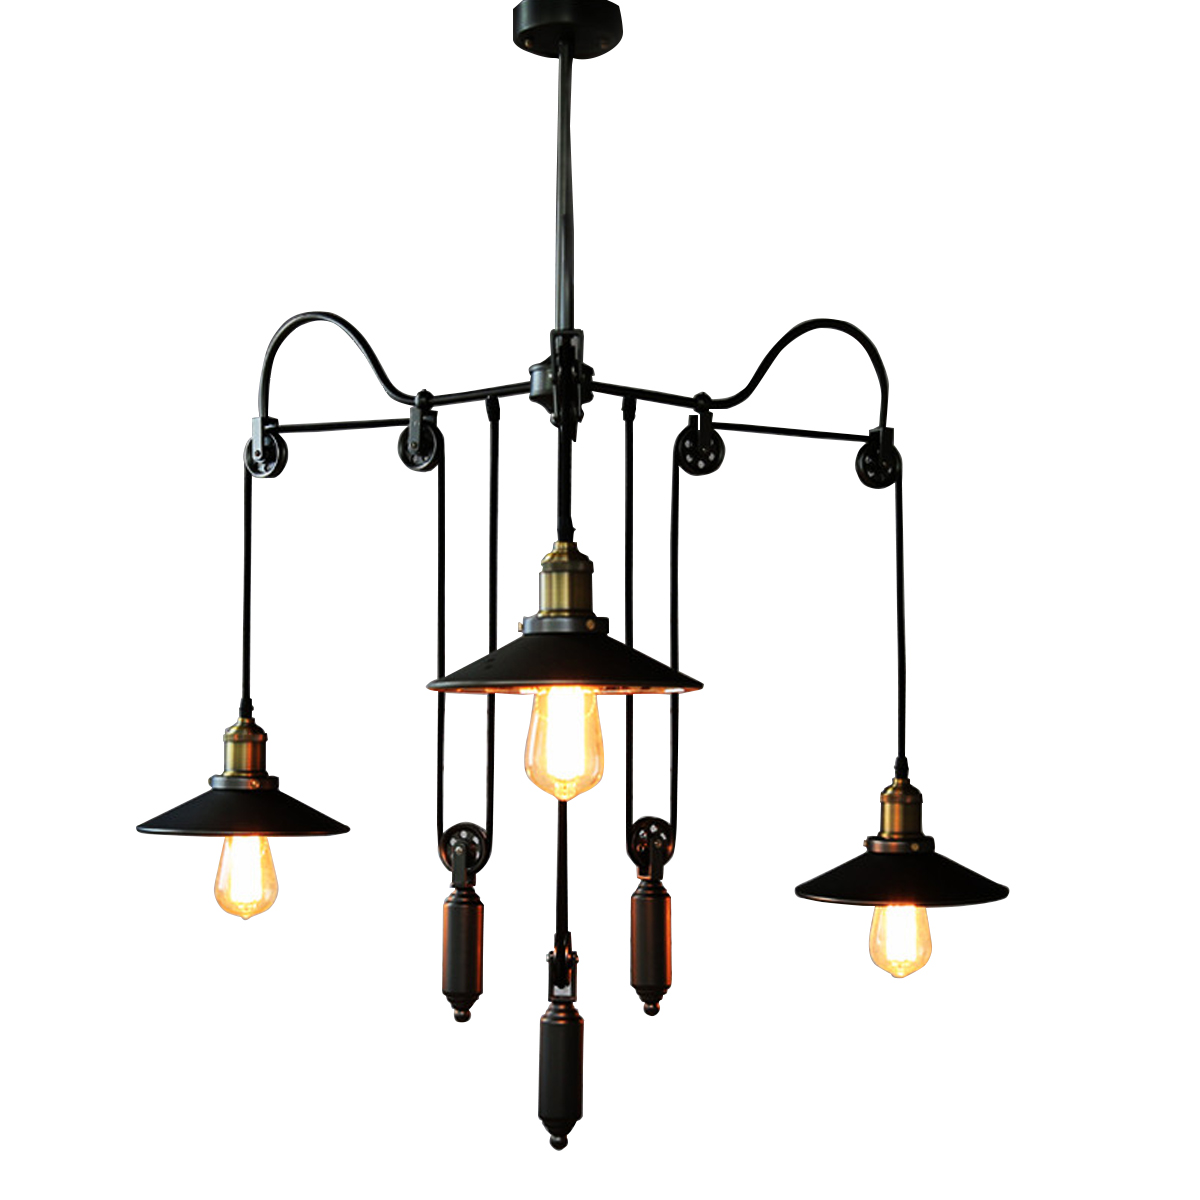 Pendant Lighting Manufacturers: Aliexpress.com : Buy Modern Pendant Lamp Nordic Village